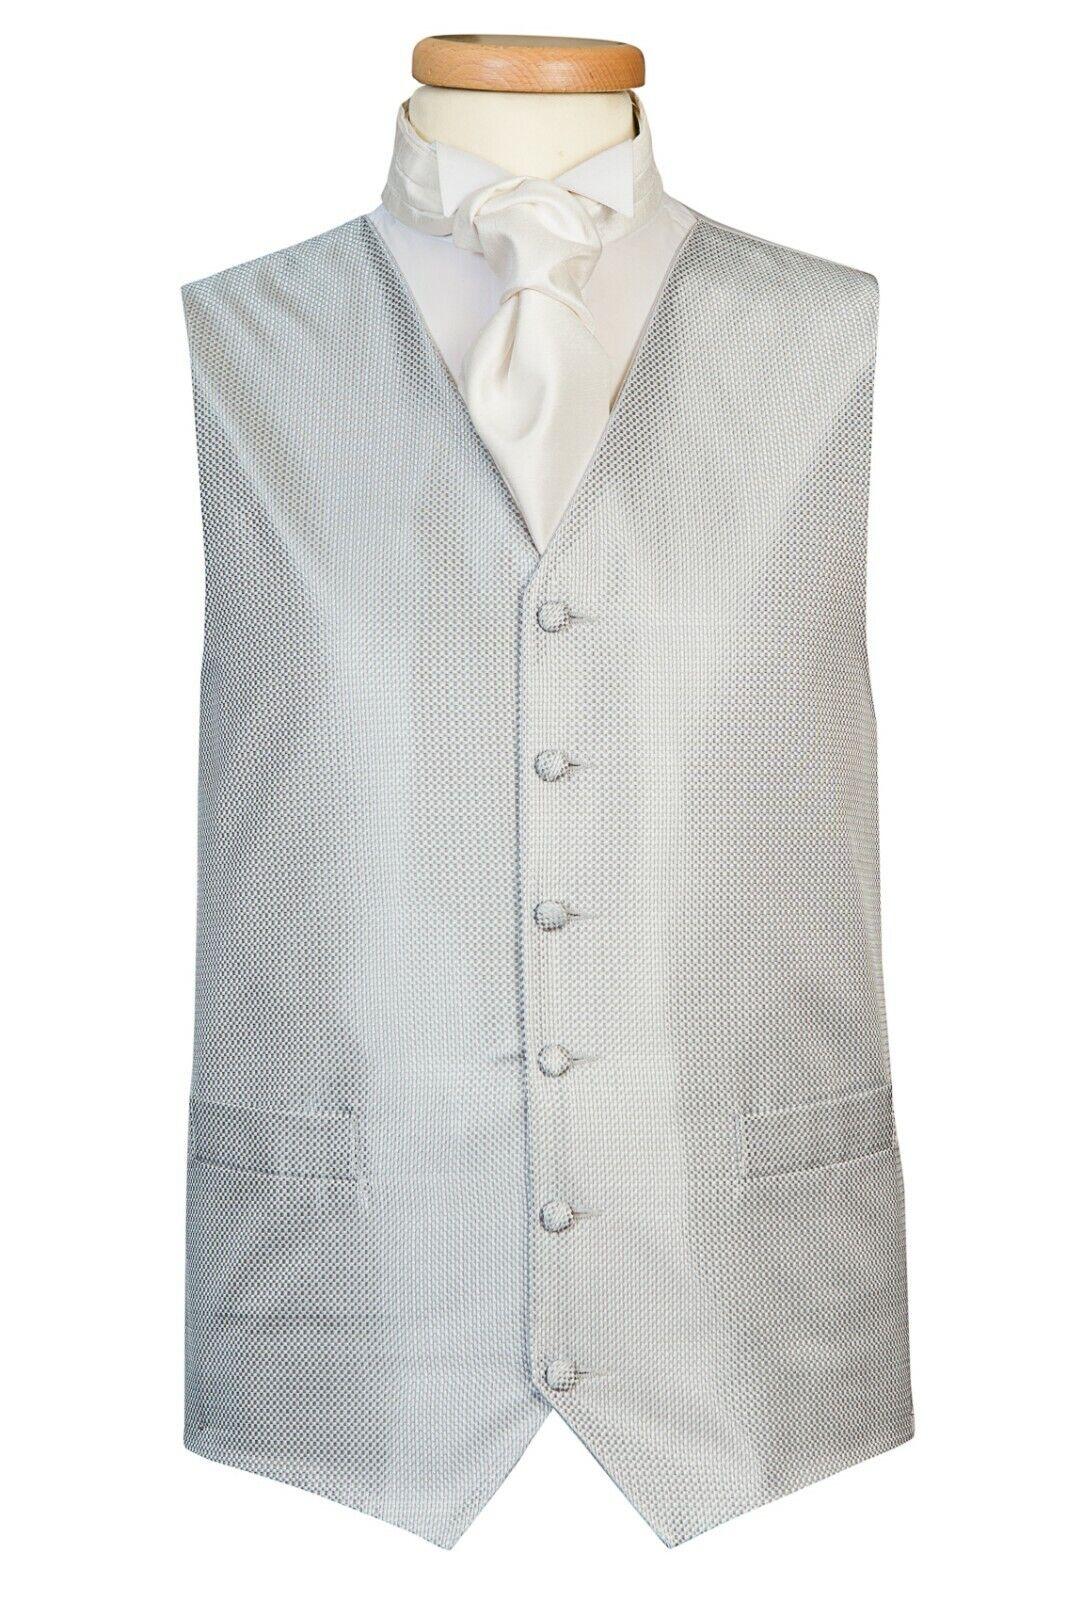 Grey Shimmer Dot Waistcoat Vest Wedding Formal UK Men's (A46)